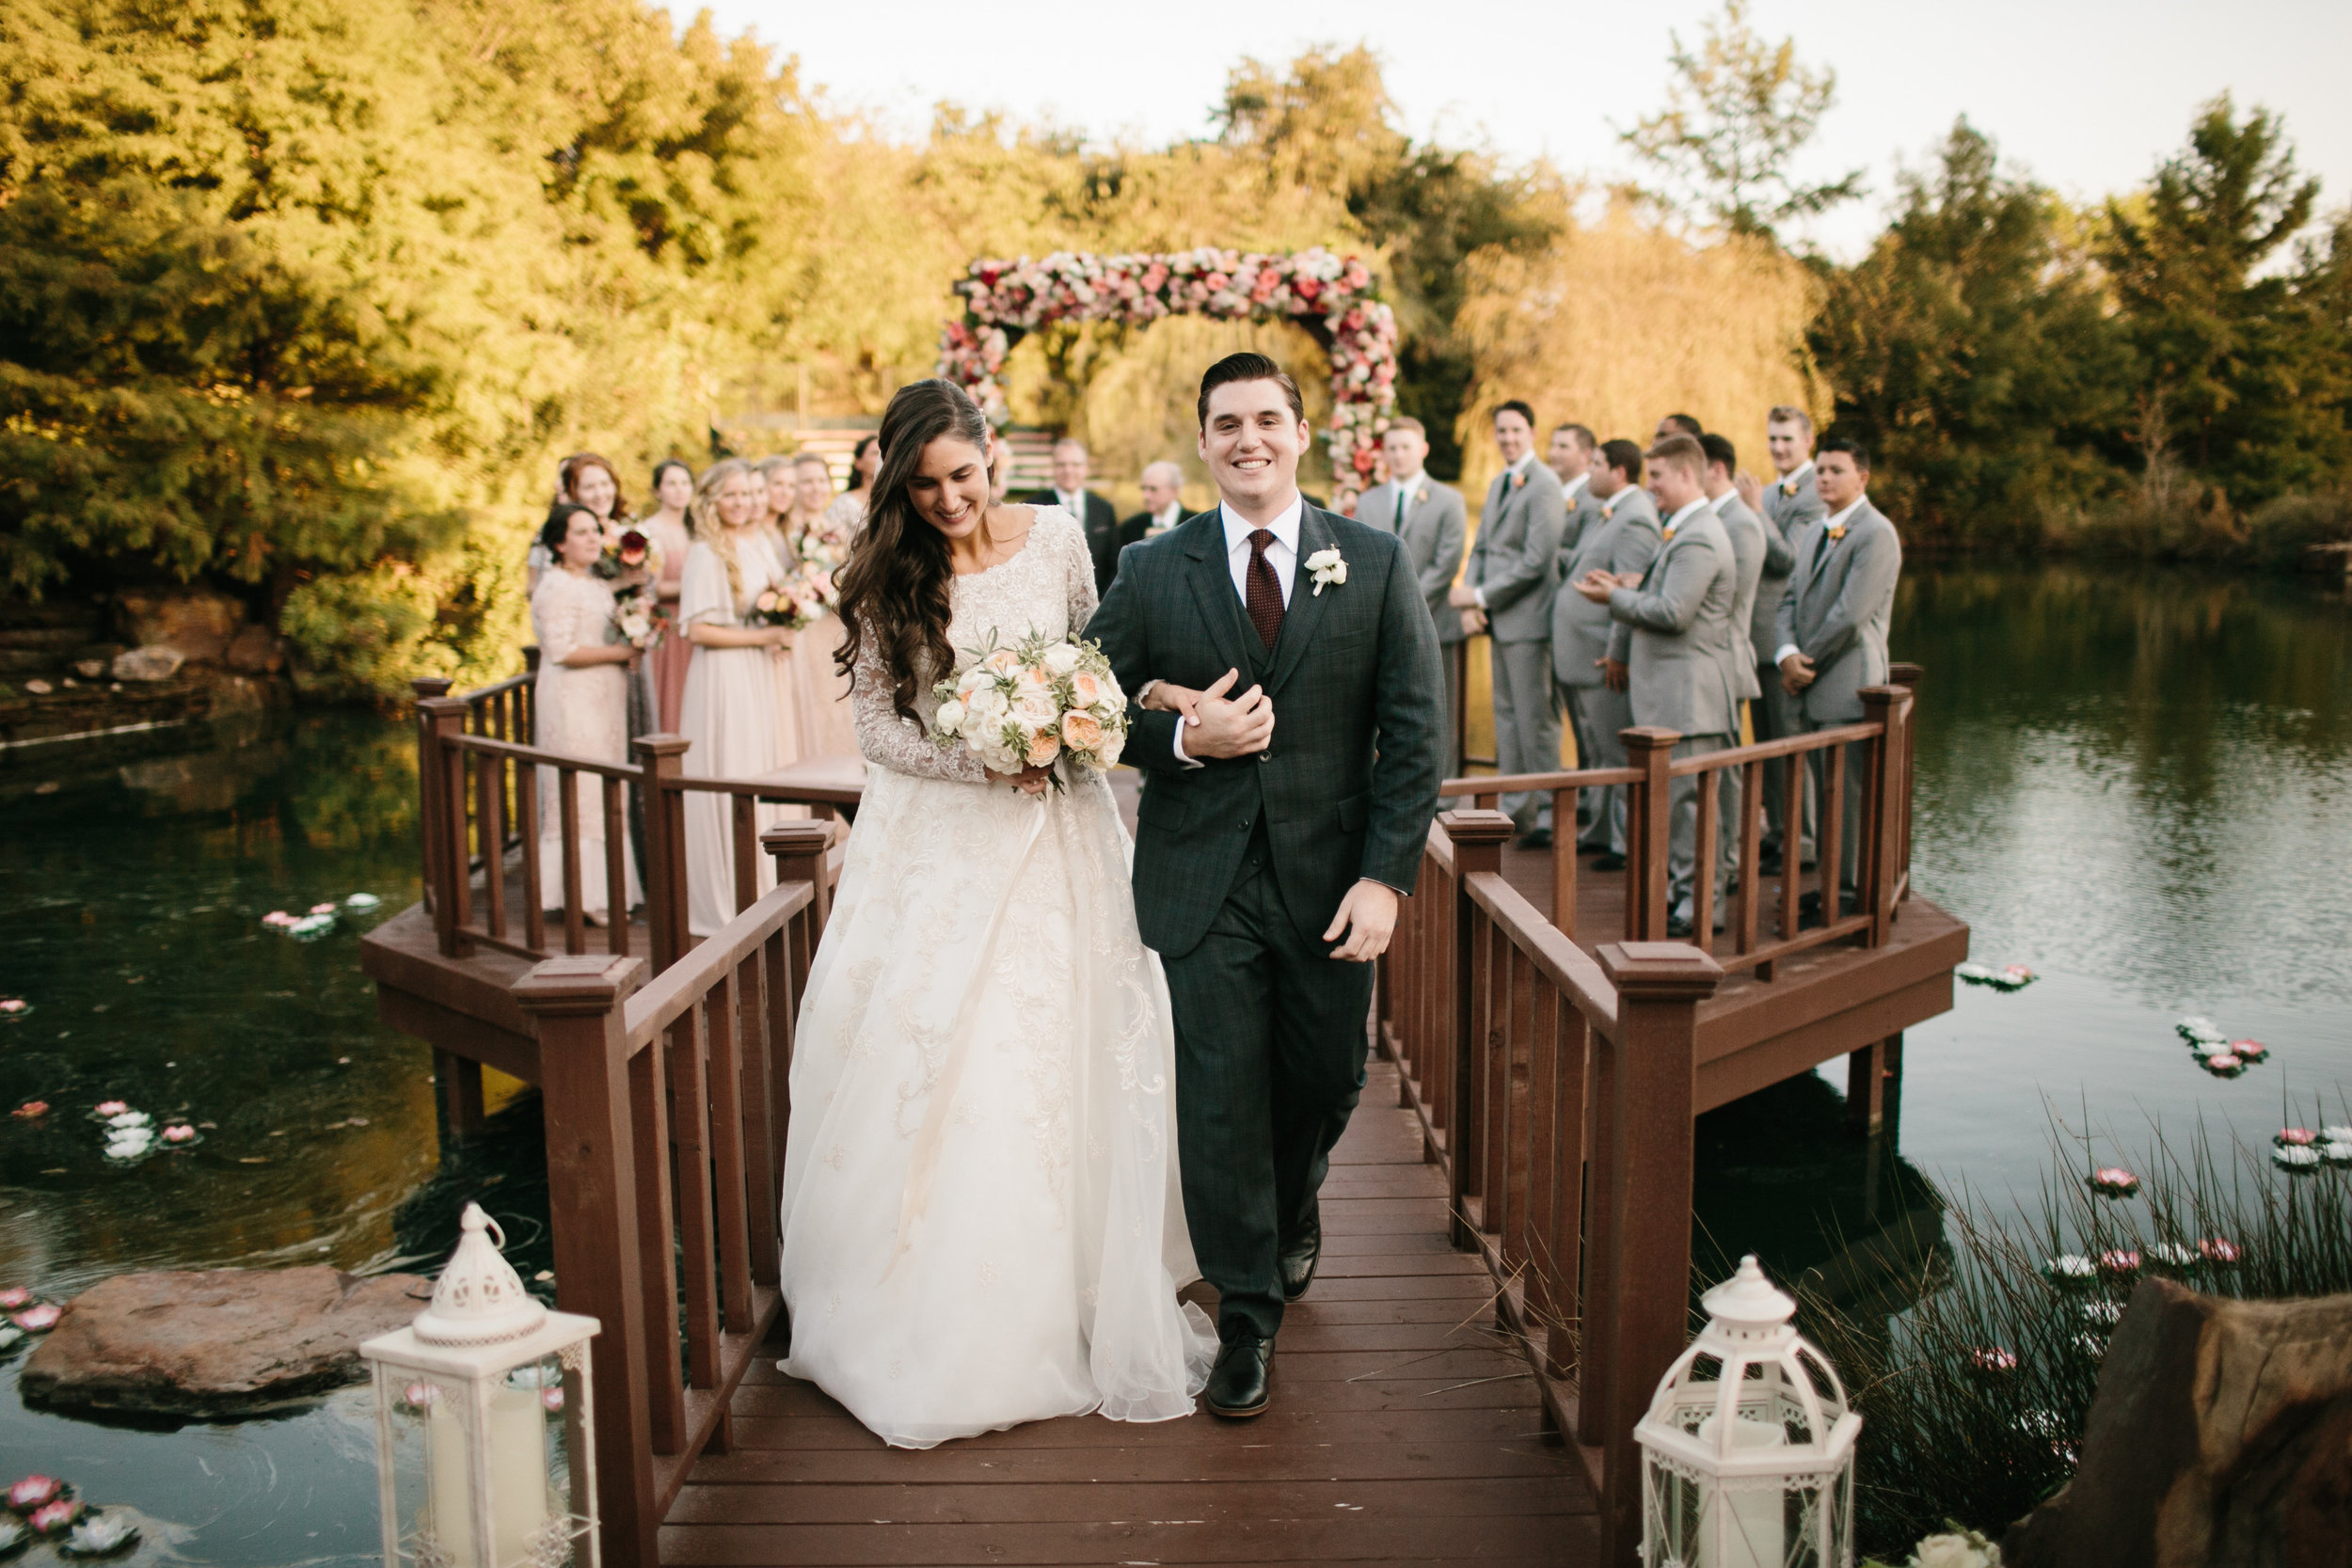 shannon_rose_rent_my_dust_fall_wedding_ (17).jpg